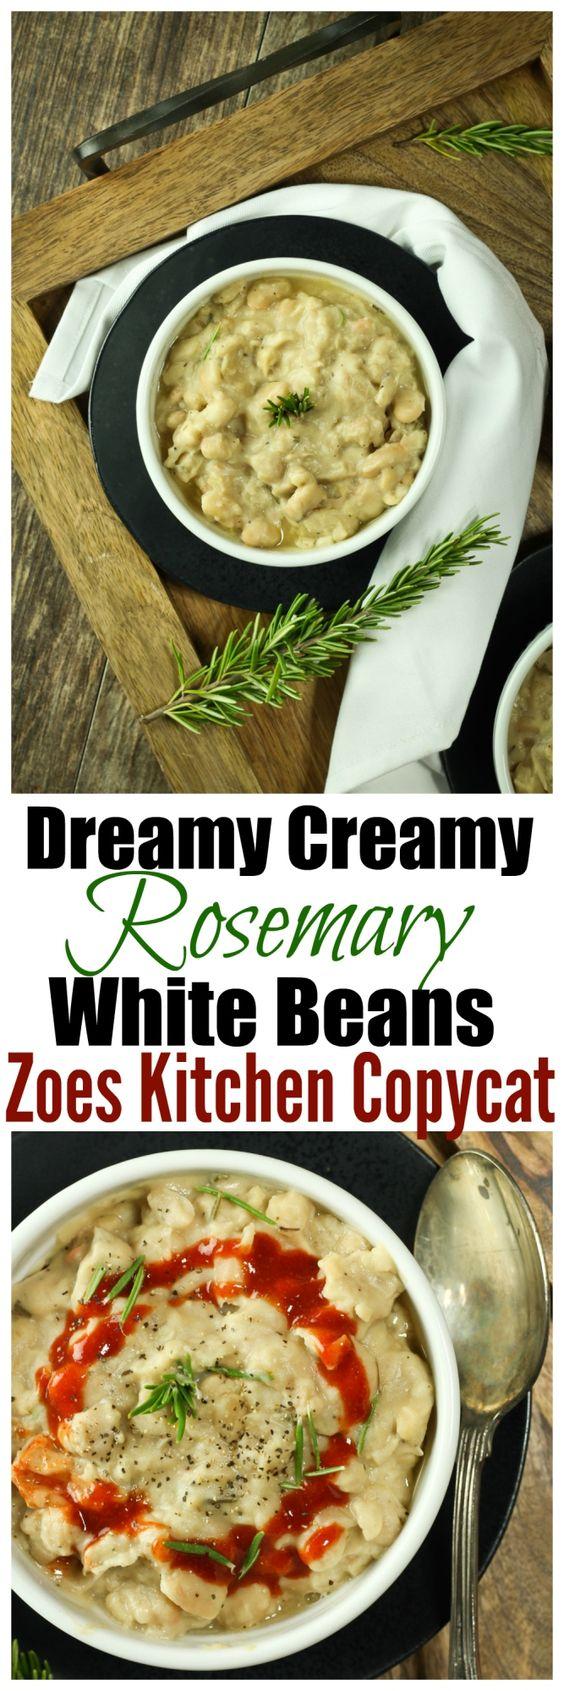 Zoes Kitchen Braised White Beans Recipe